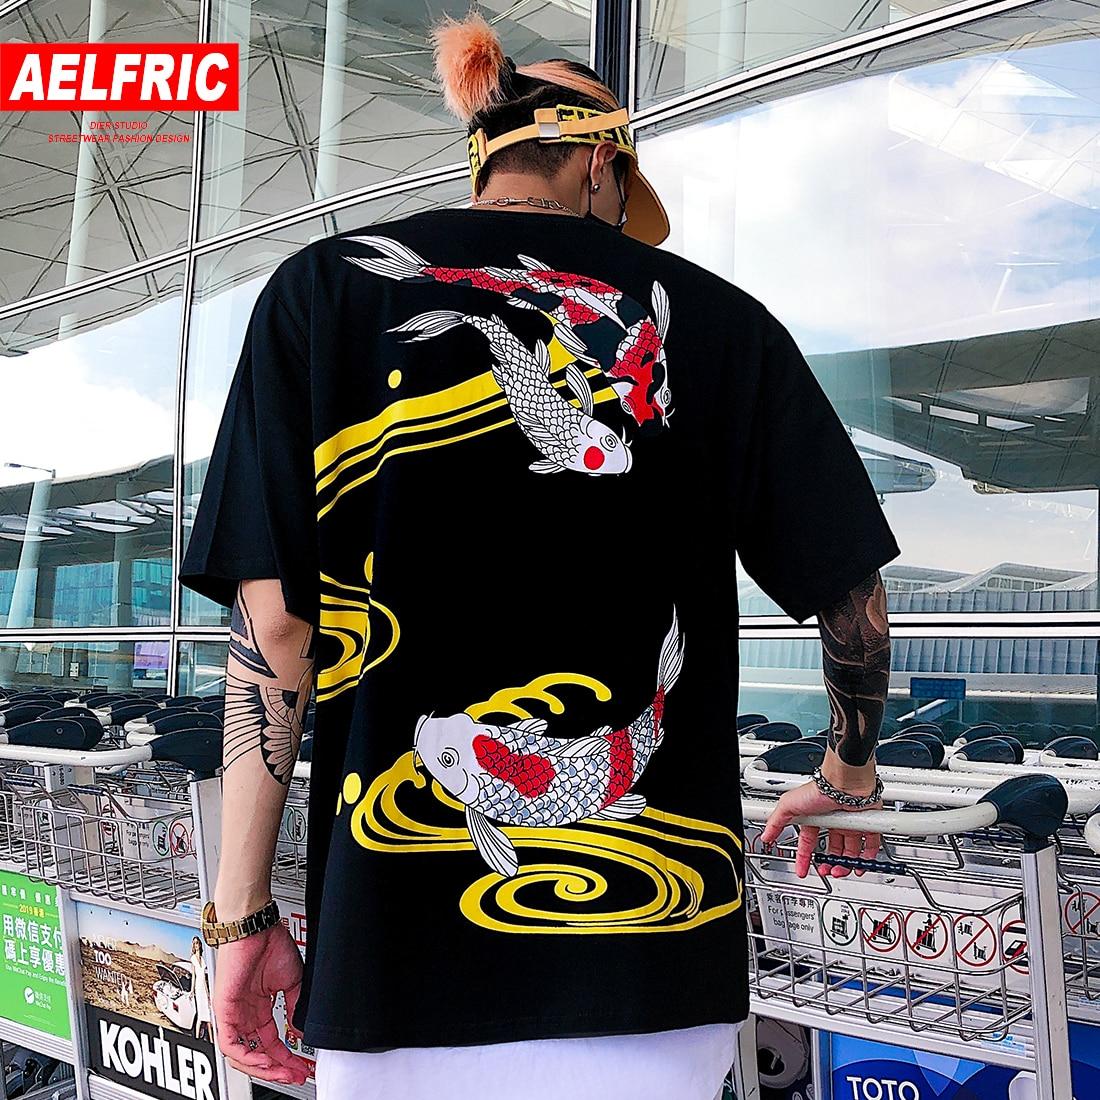 AELFRIC Japanese Style Koi Print Hip Hop Short Sleeve T-shirts Men Women Casual Streetwear 2019 Summer T-shirt Cotton Tops Tees